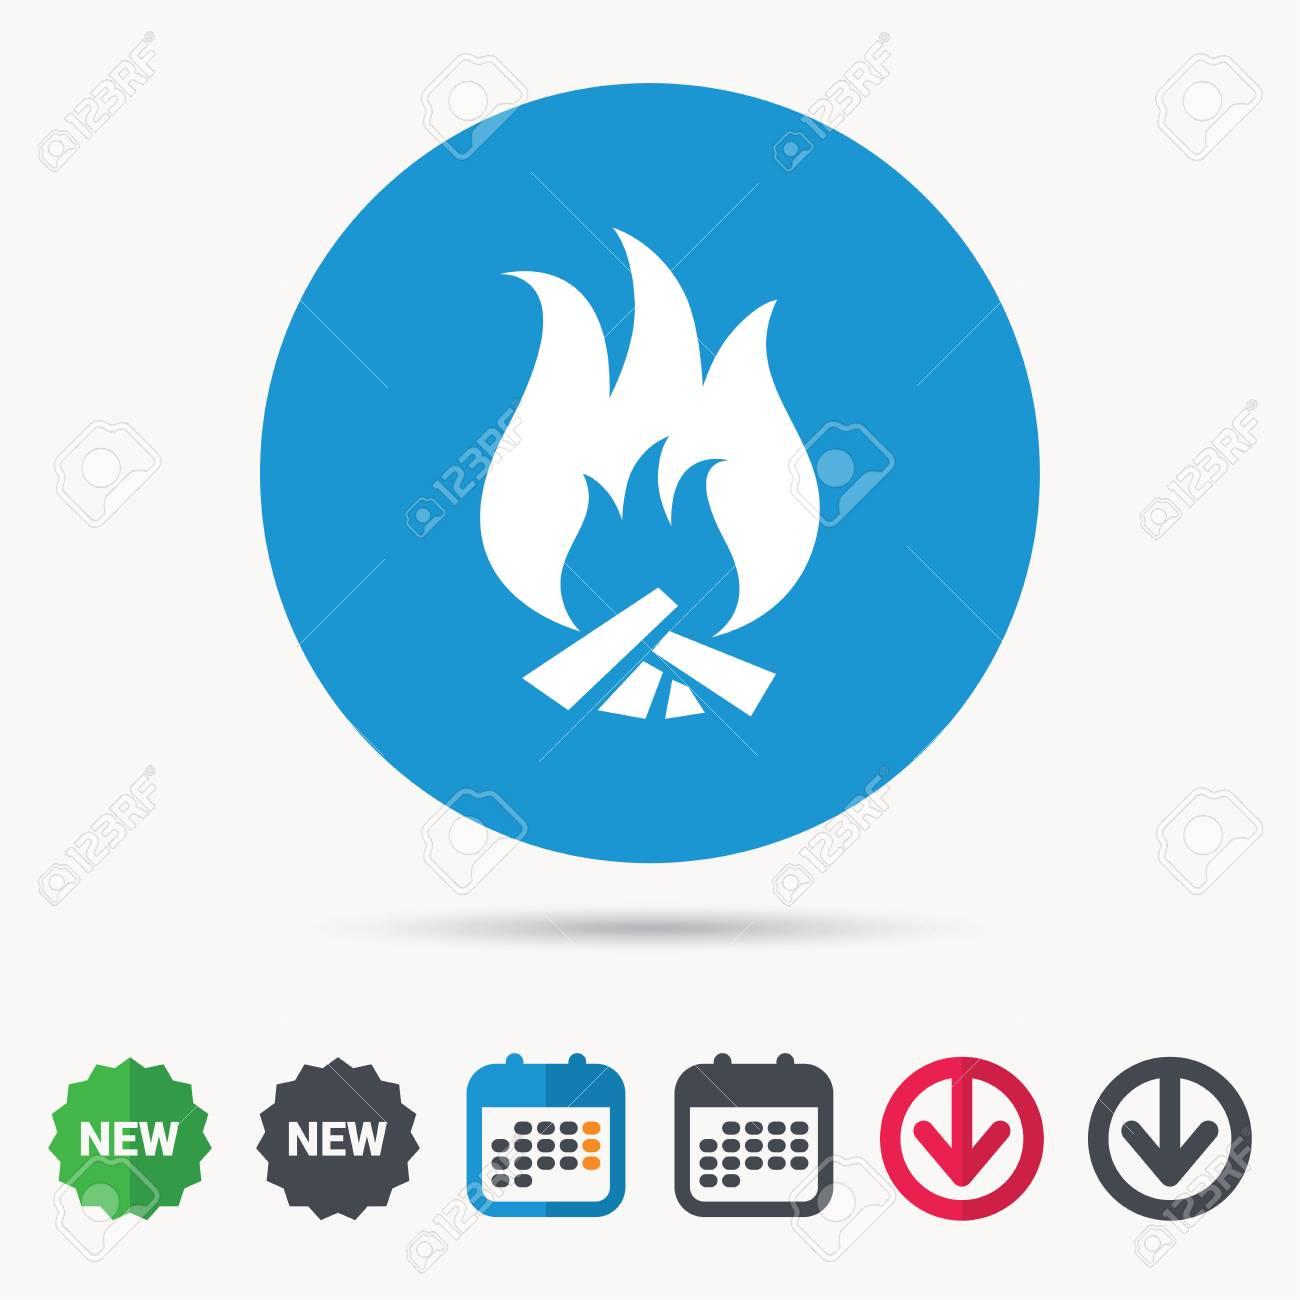 Fire icon  Blazing bonfire flame symbol  Calendar, download arrow